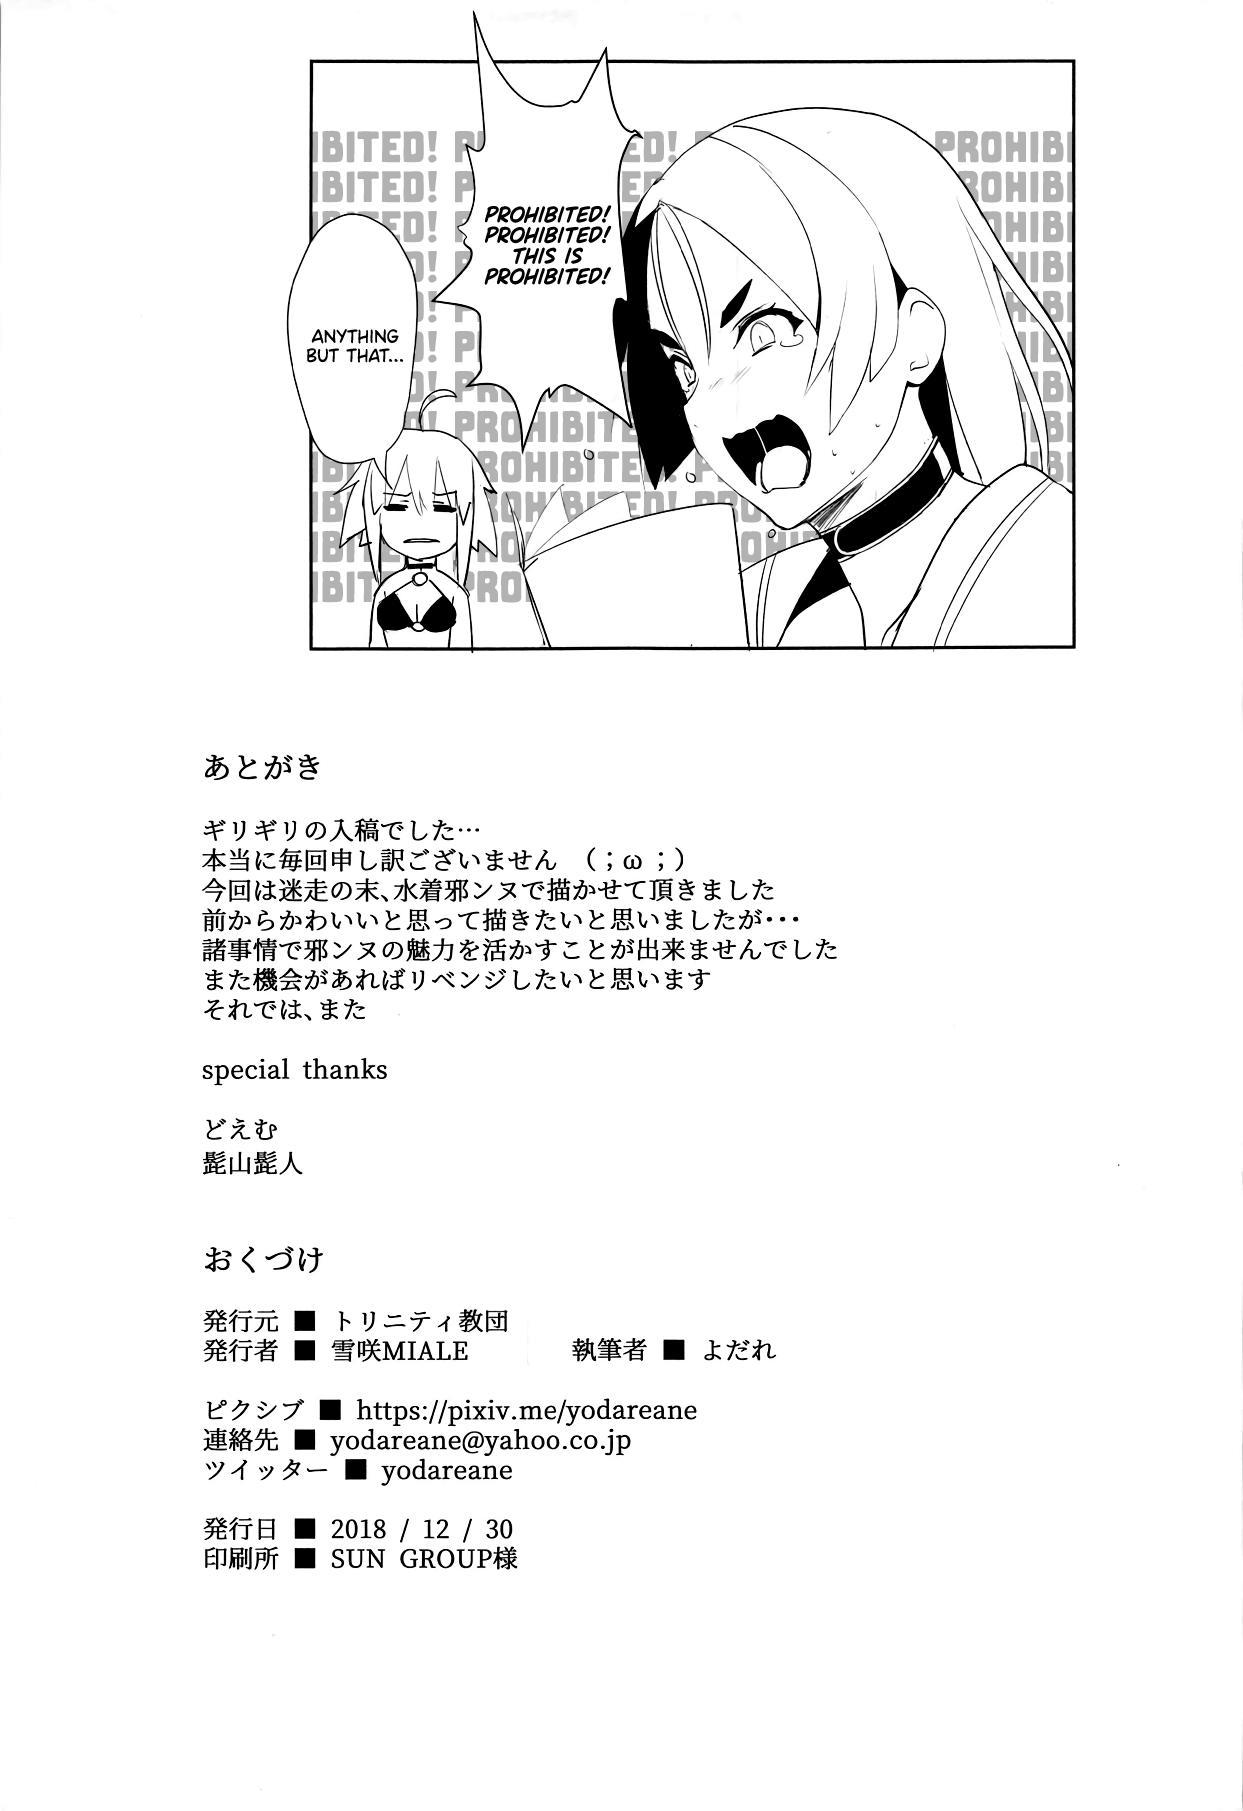 Chaldea no Eromanga Sensei   Chaldea's Eromanga Sensei 21